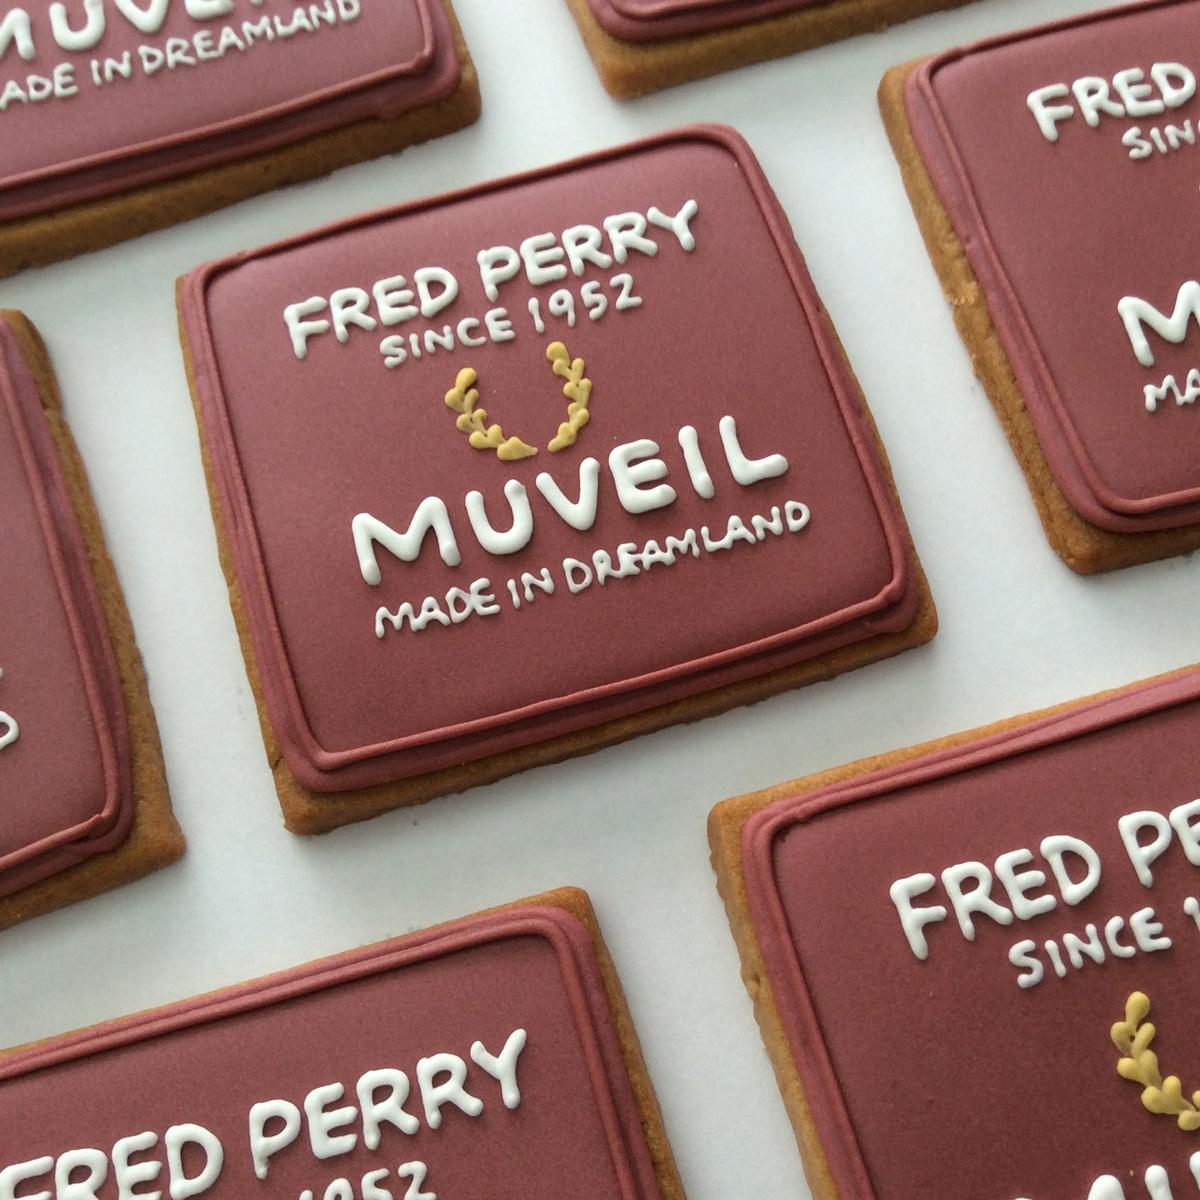 「MUVEIL / FRED PERRY」ノベルティクッキー